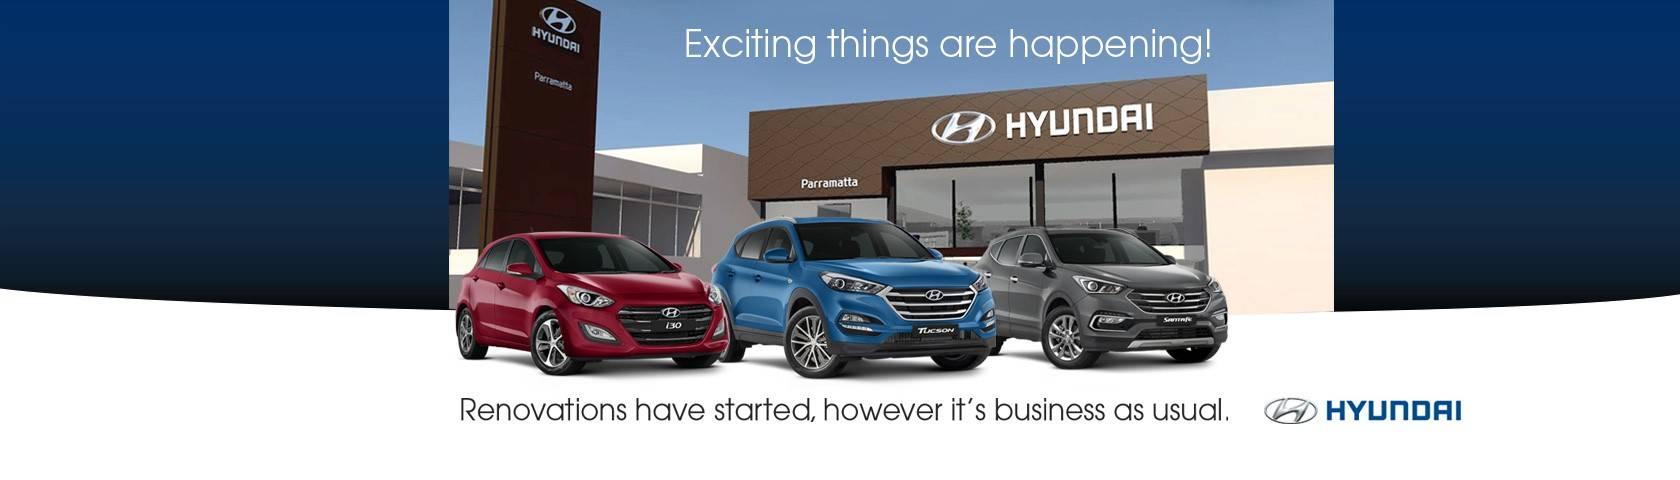 Parramatta Hyundai